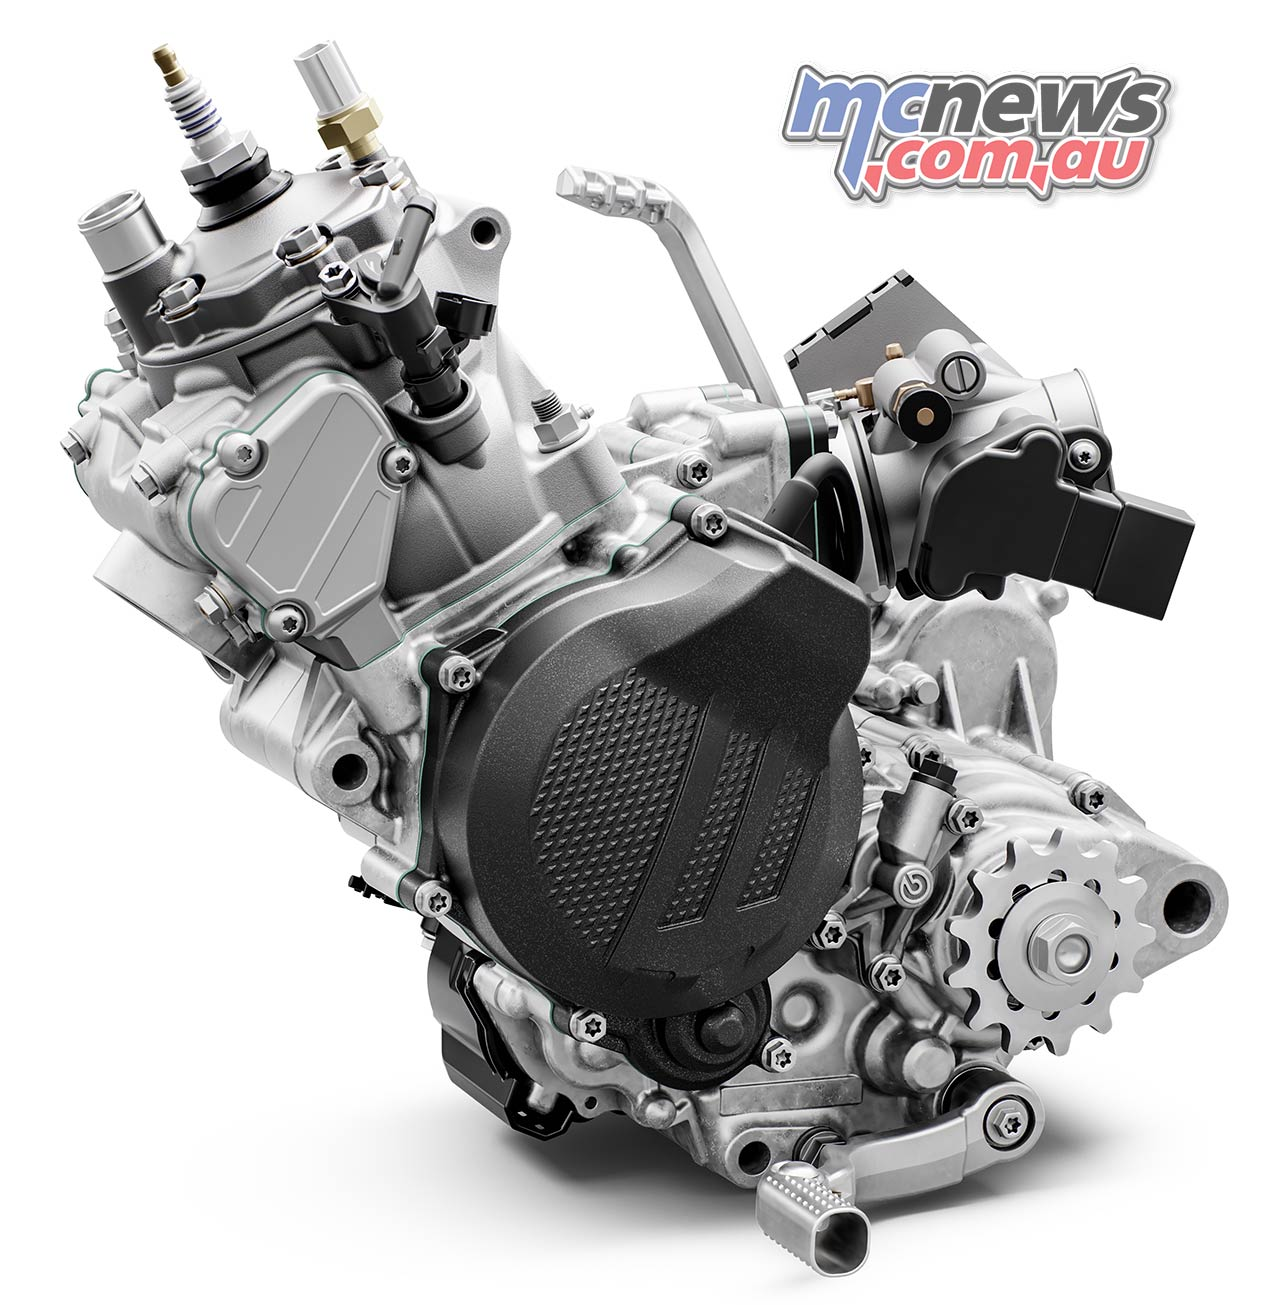 Enduro KTM EXC Engine Left